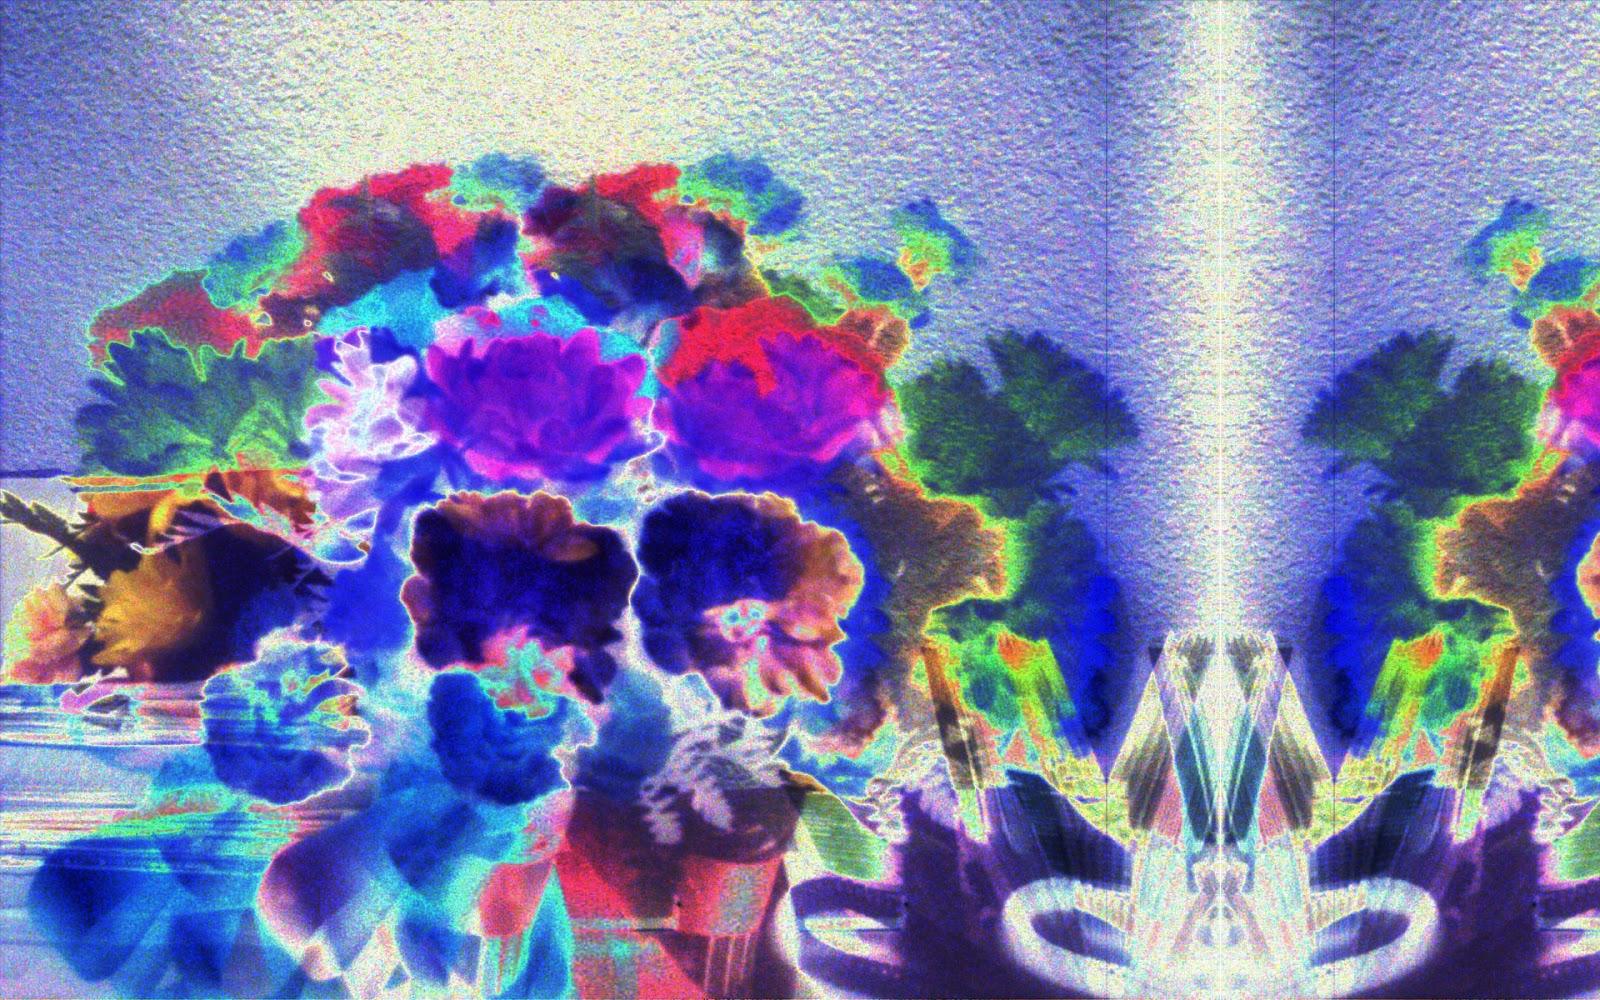 Trippy Hippie Wallpaper - WallpaperSafari